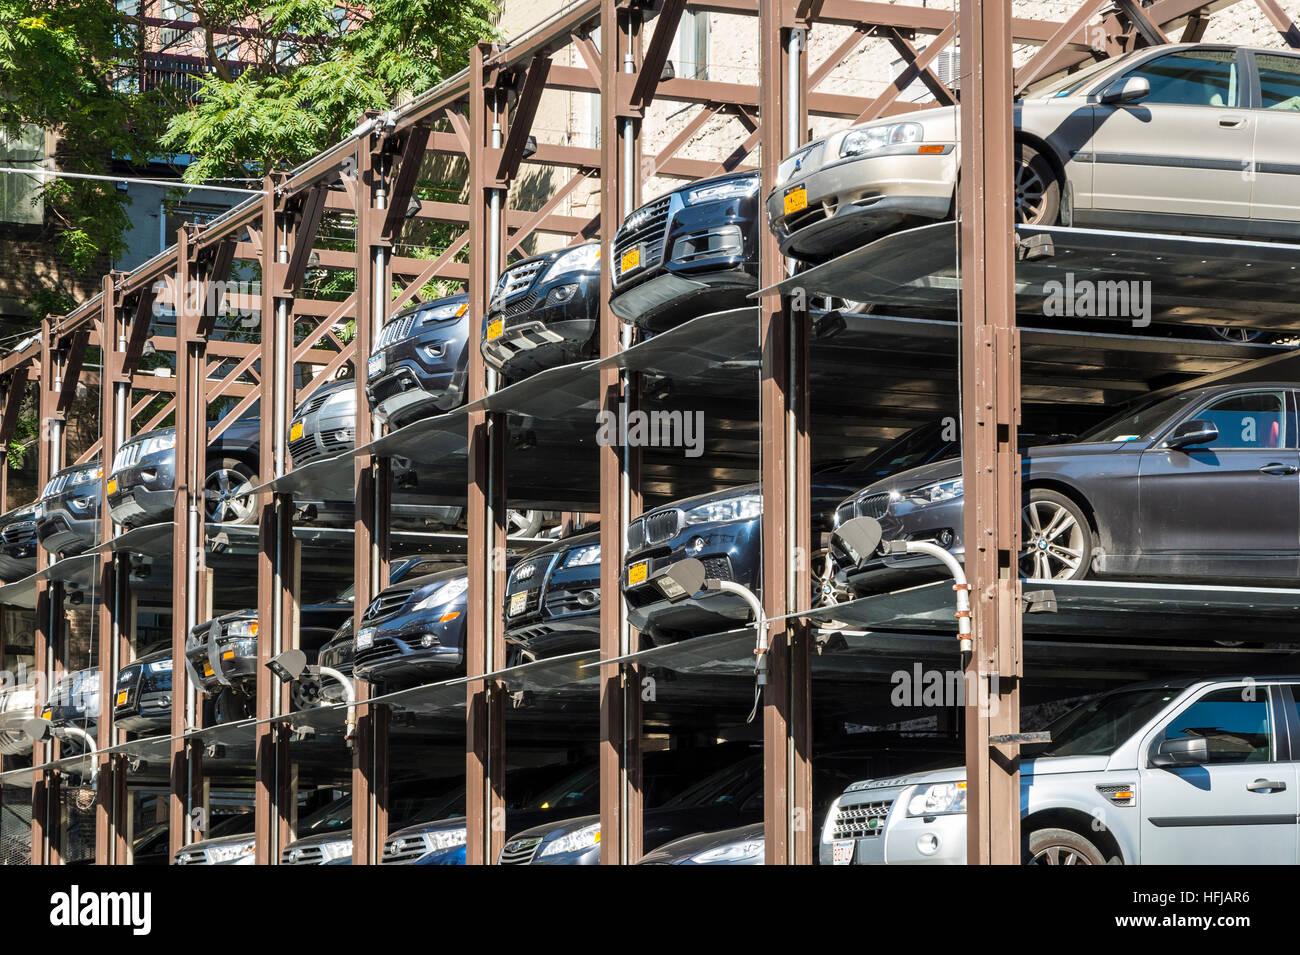 Vertikale mechanische gestapelt Parkplatz in New York, USA Stockbild